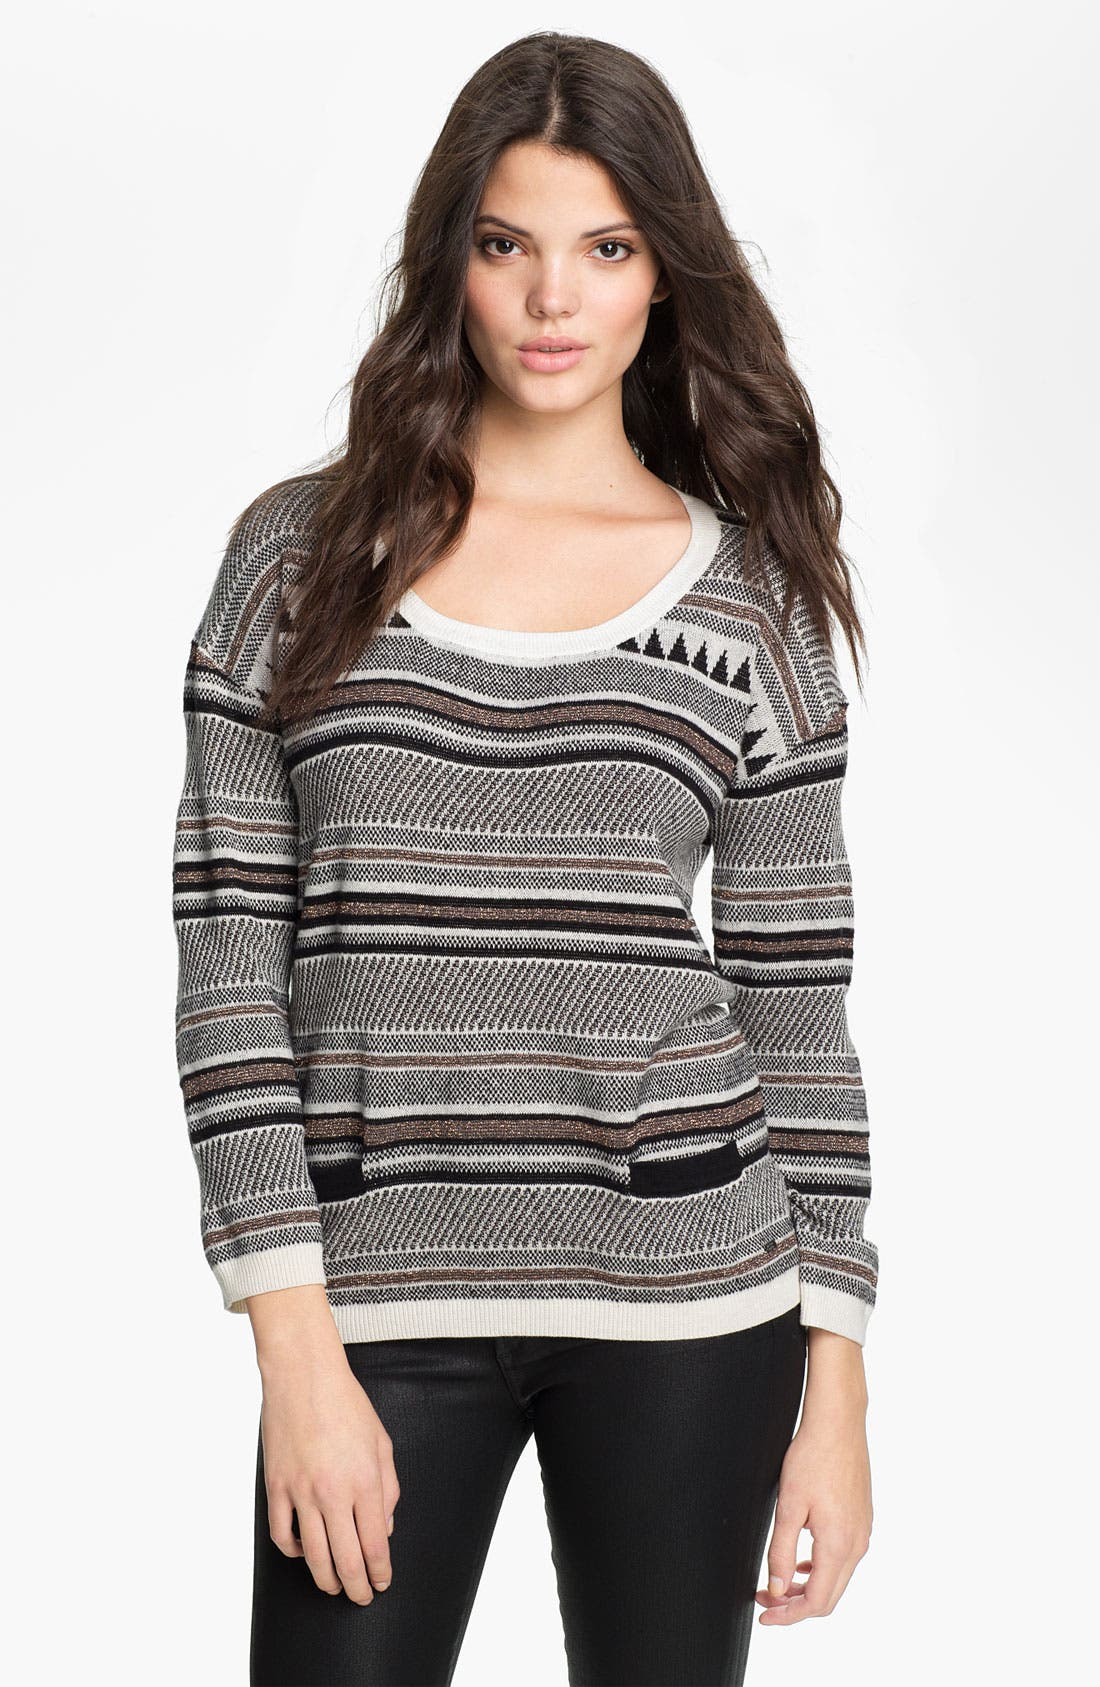 Alternate Image 1 Selected - Maison Scotch Nordic Knit Sweater